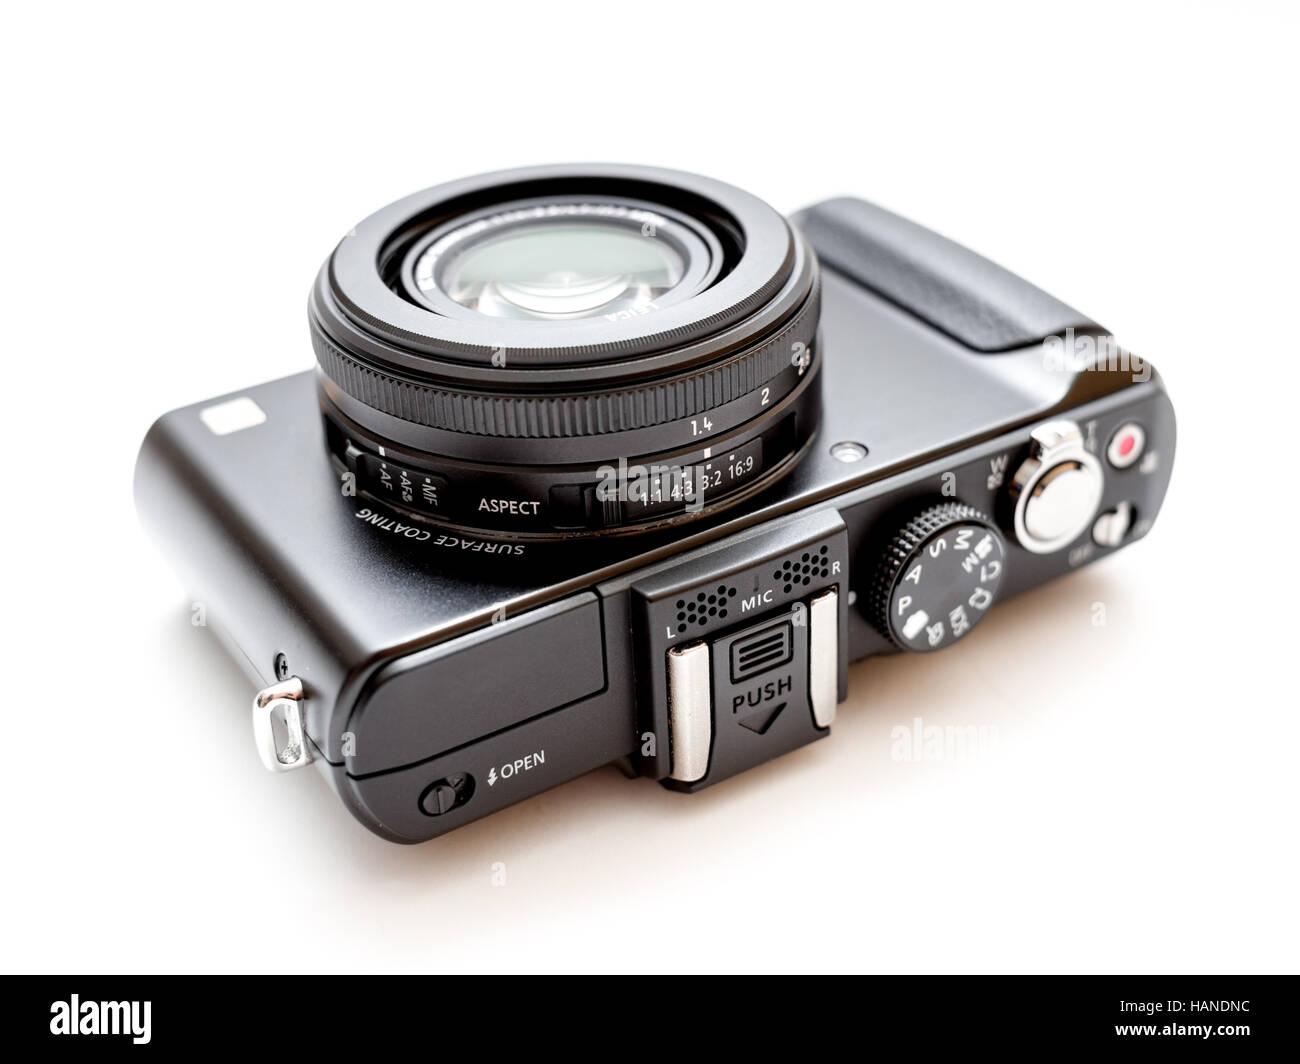 Rome, Italy - June 14, 2016: compact digital camera - Stock Image